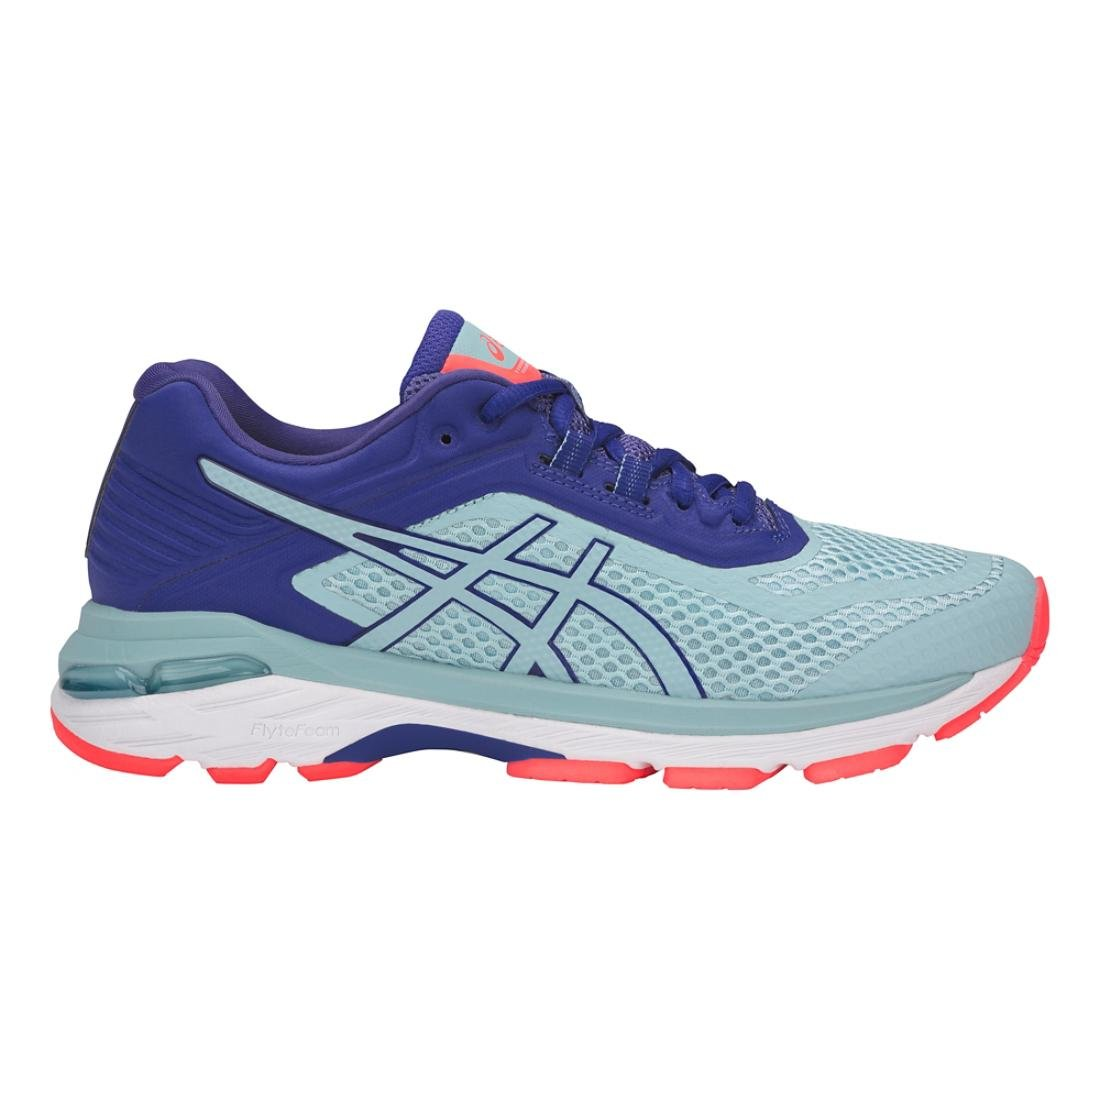 ASICS B(M) Women's GT-2000 6 Running Shoe B071P9KQ25 6 B(M) ASICS US|Porcelain Blue/Porcelain Blue/Asics Blue 89ceb1